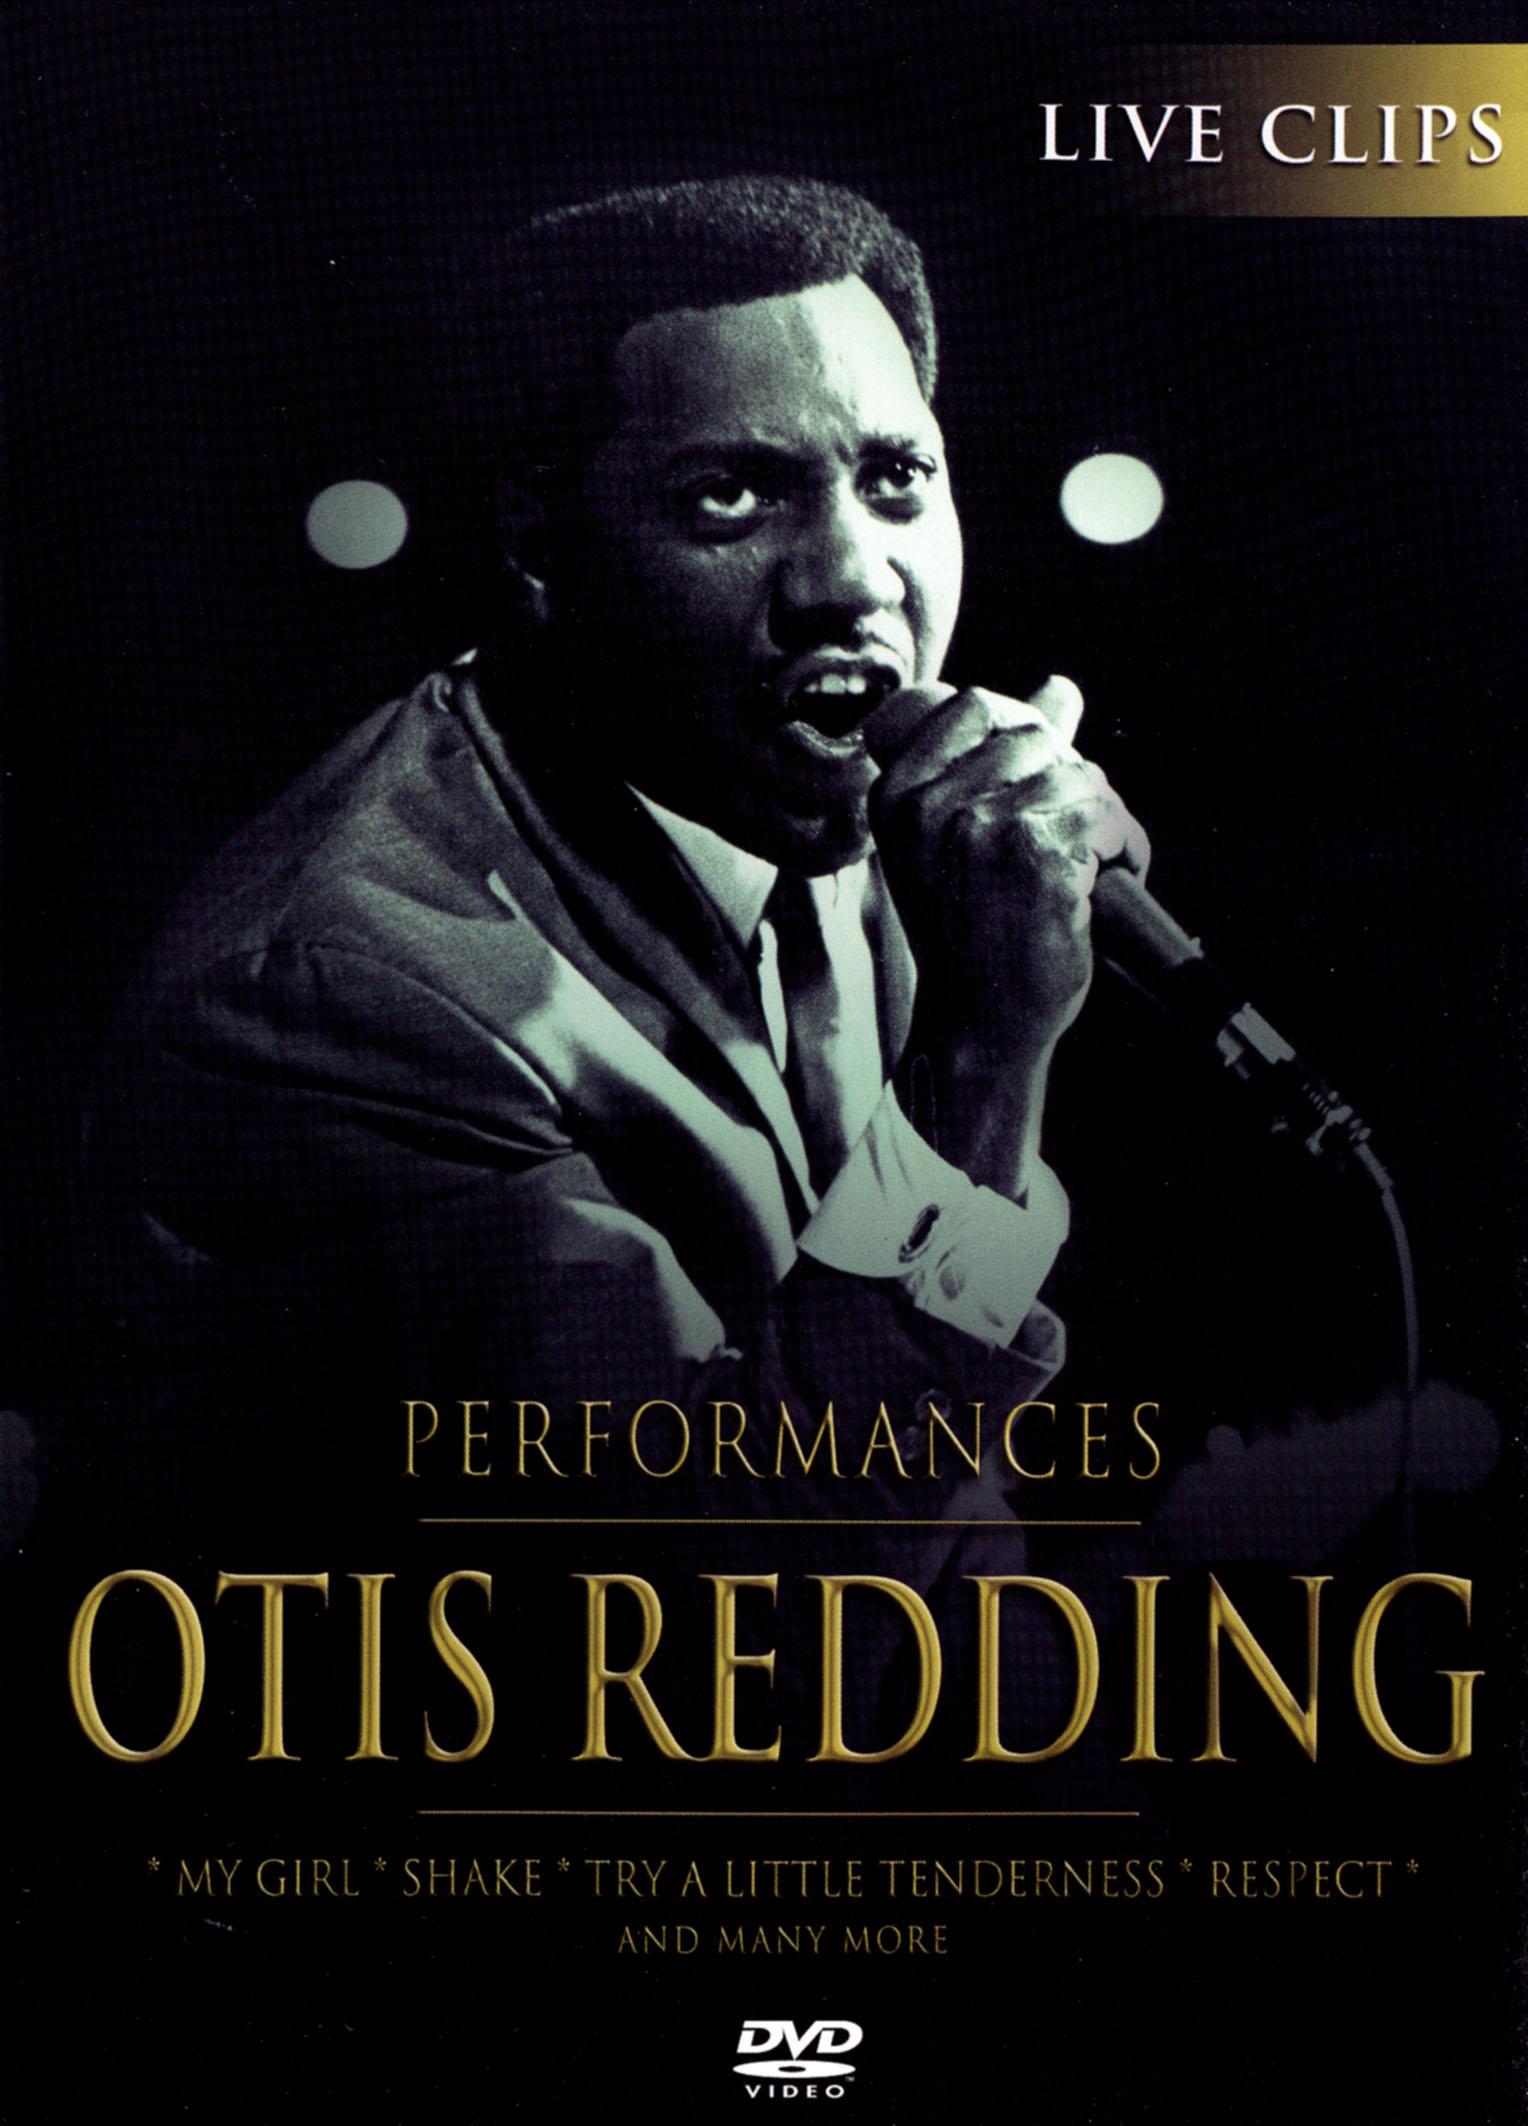 Otis Redding: Performances